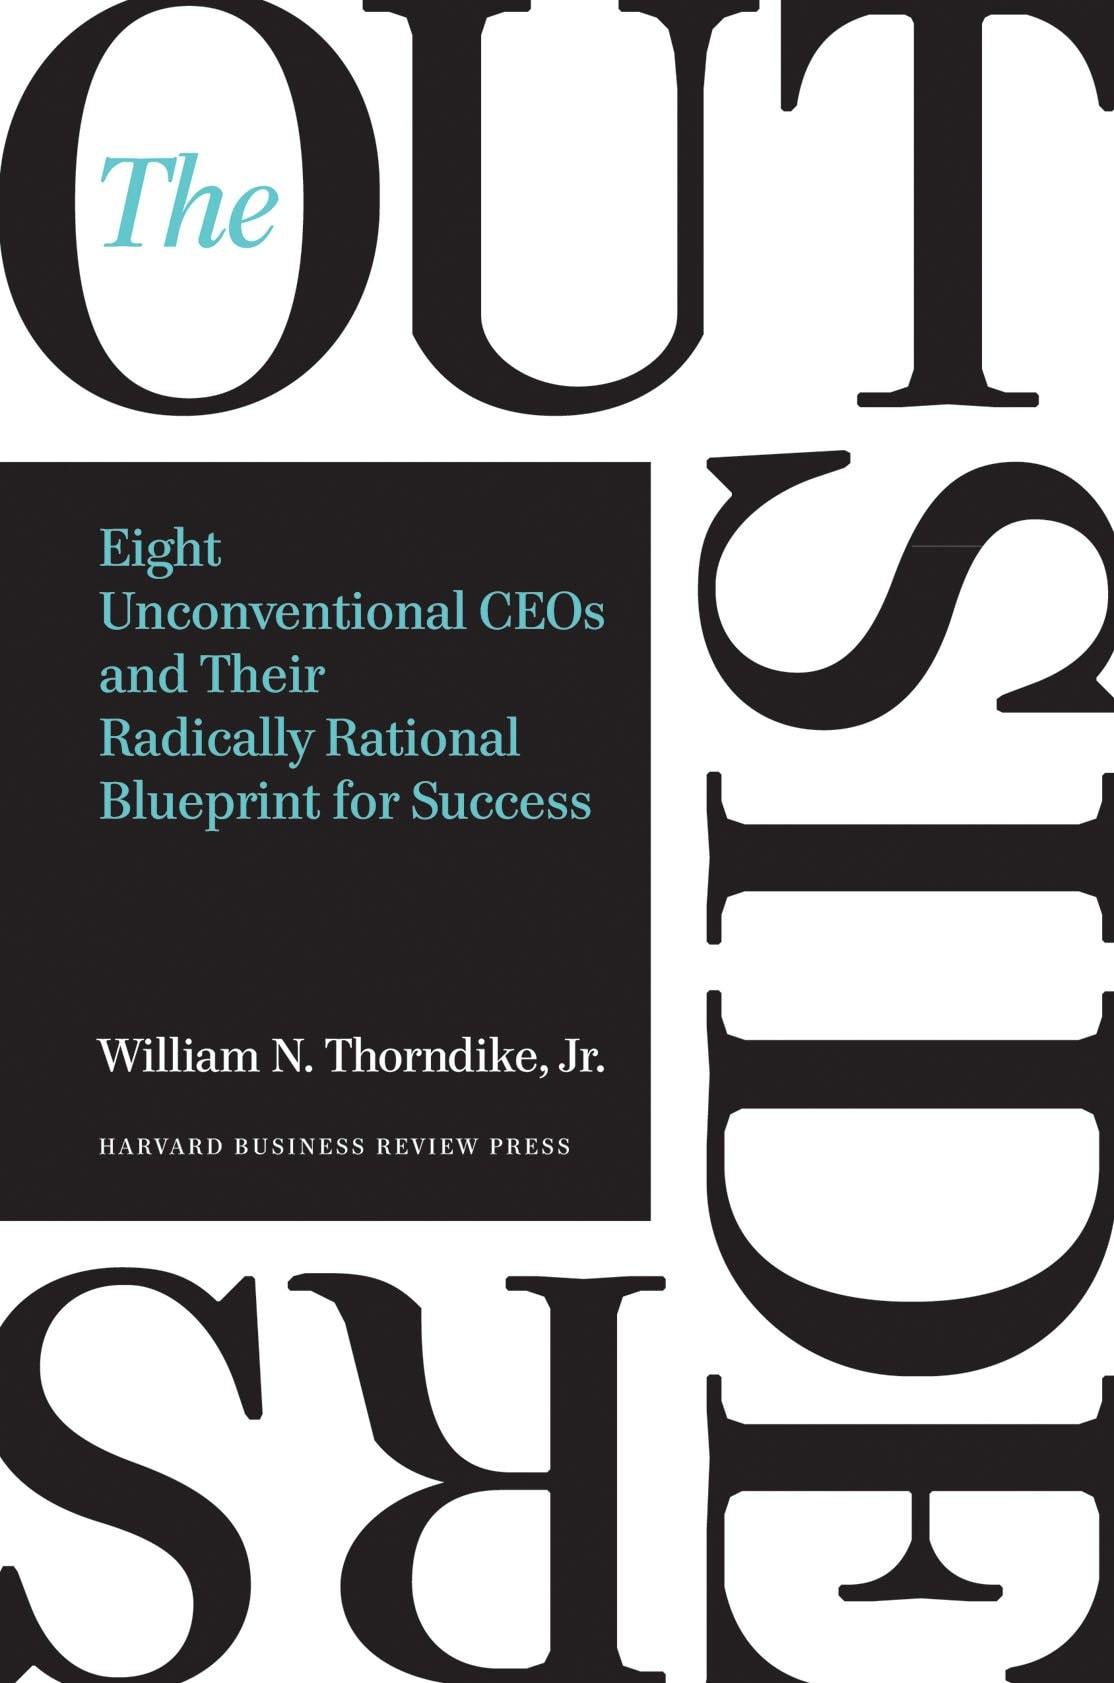 William N Thorndike Jr - The Outsiders